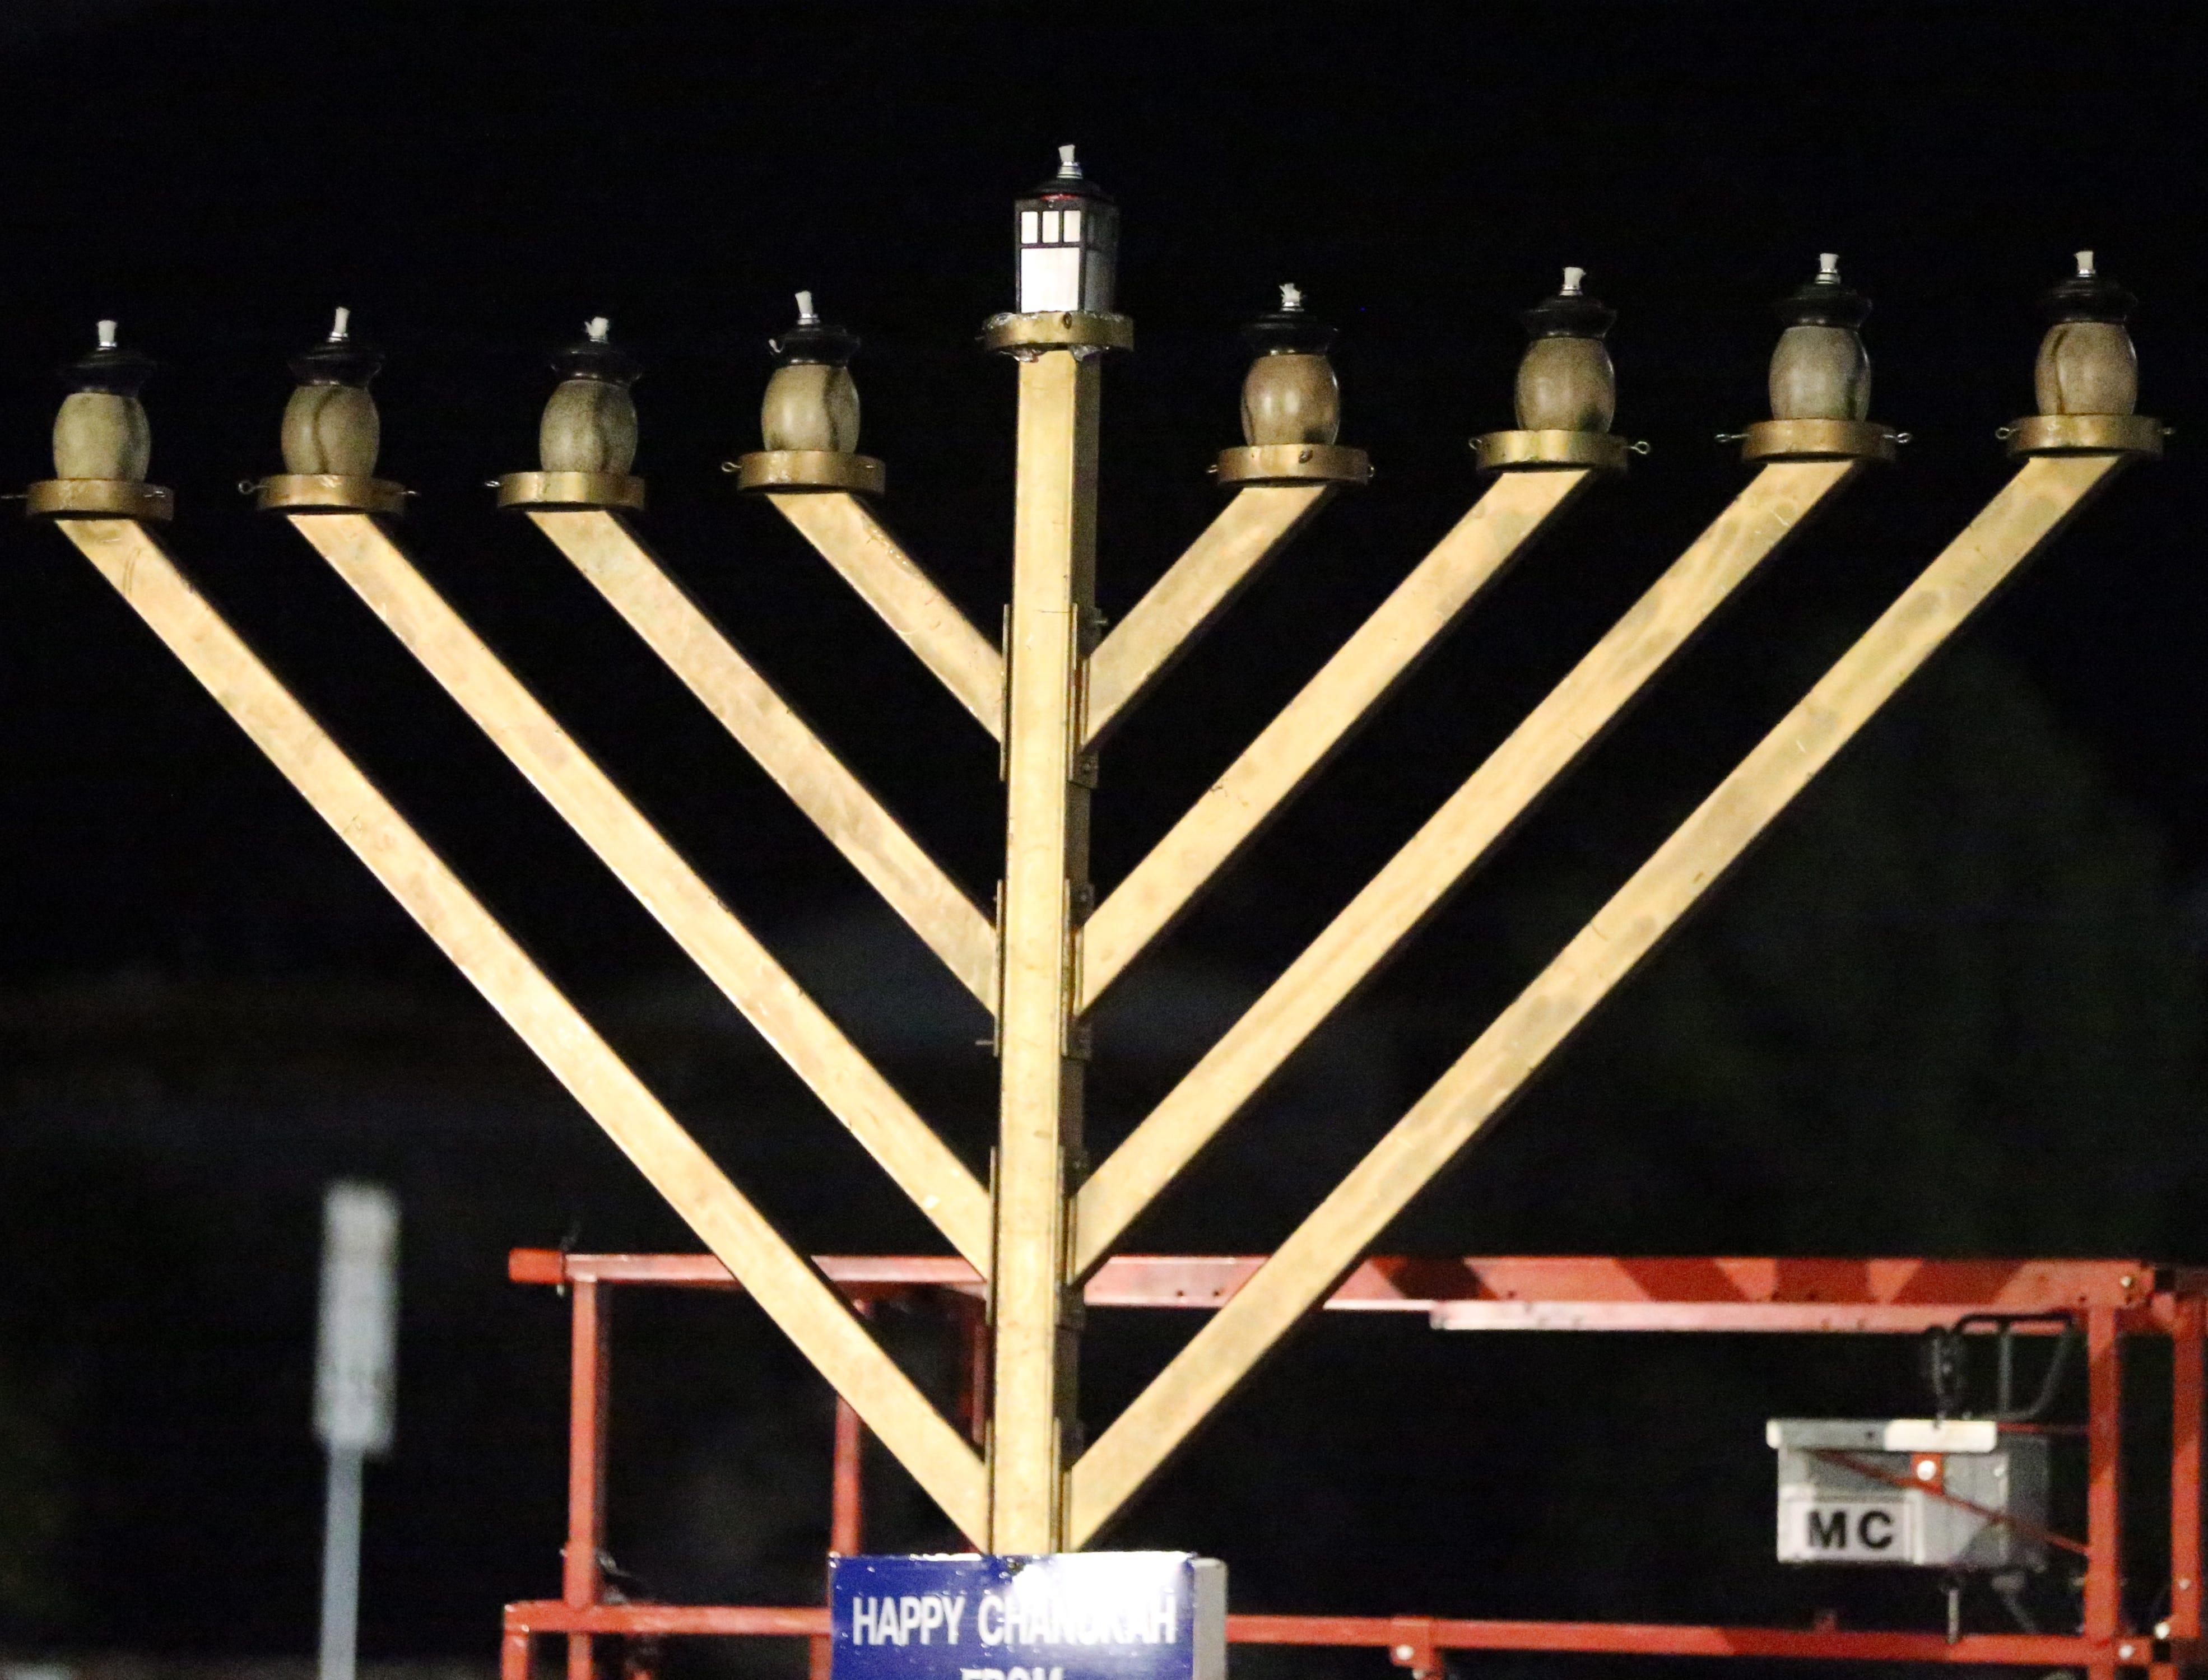 A large menorah outside Chabad Lubavitch of El Paso was lit Sunday night.